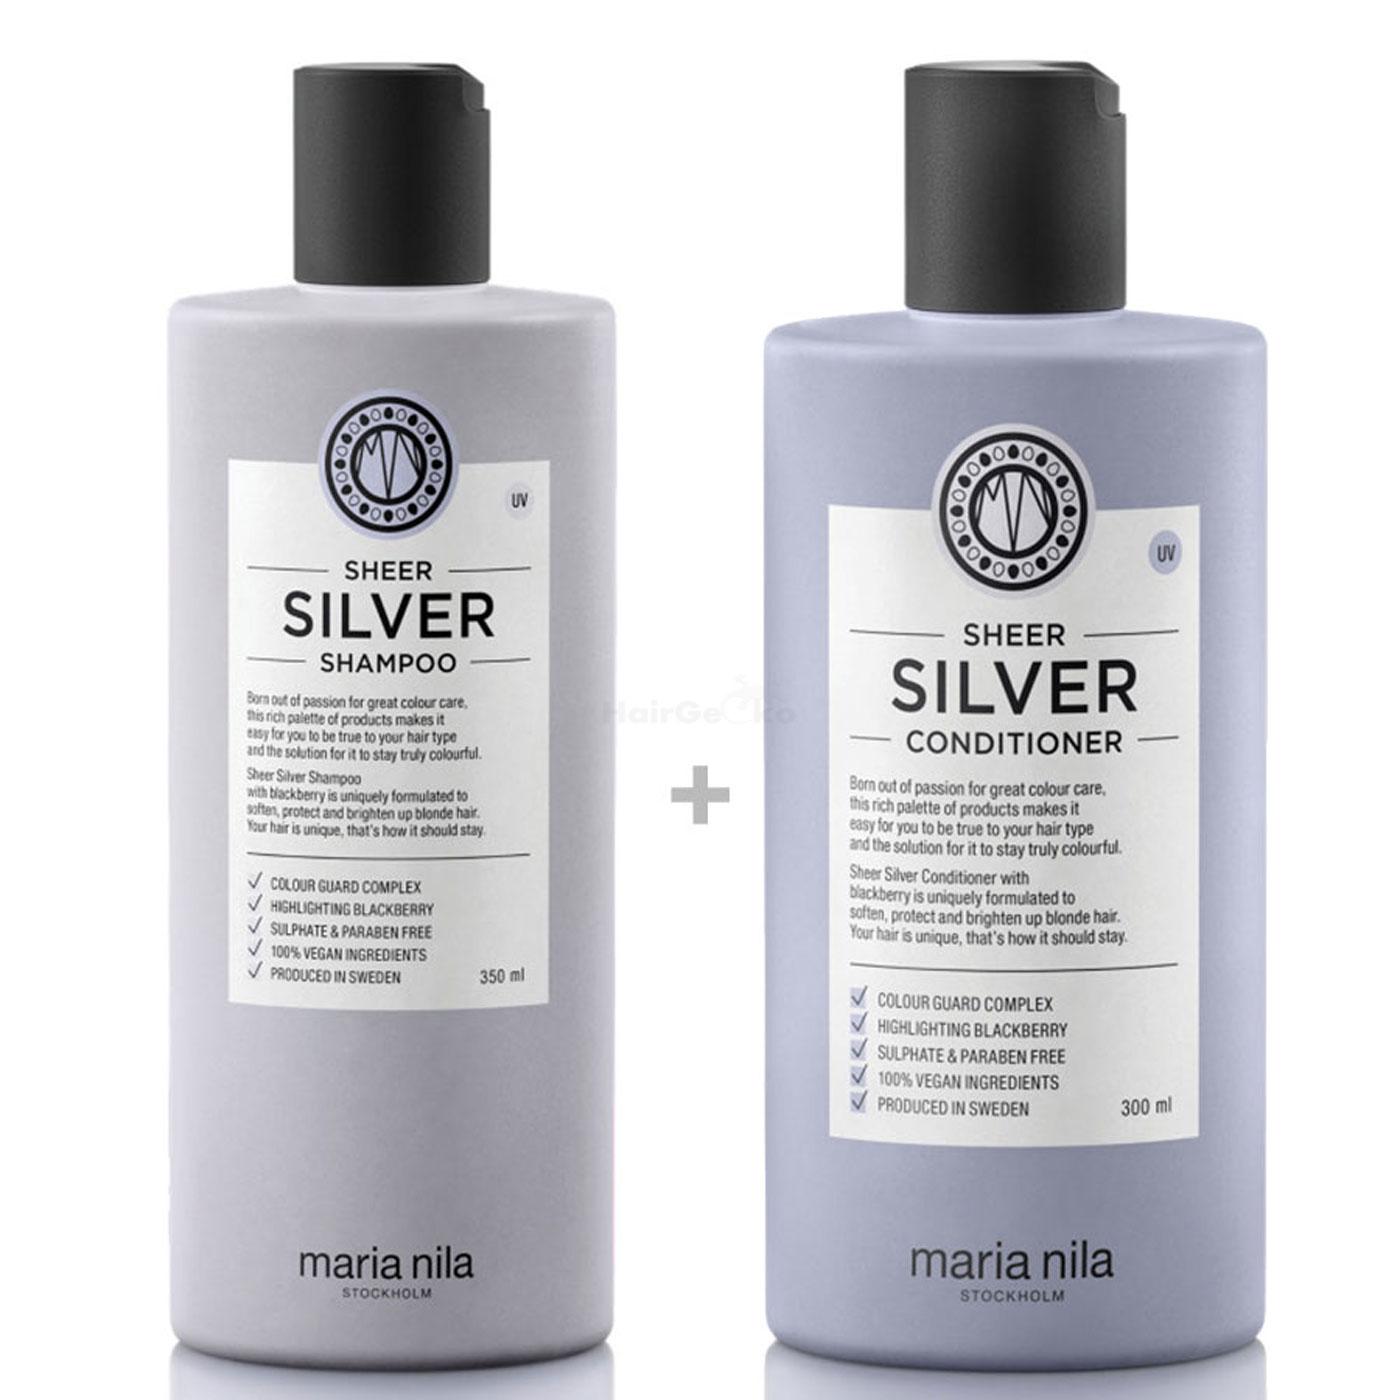 Maria Nila Sheer Silver Set - Shampoo 350 ml + Conditioner 300 ml